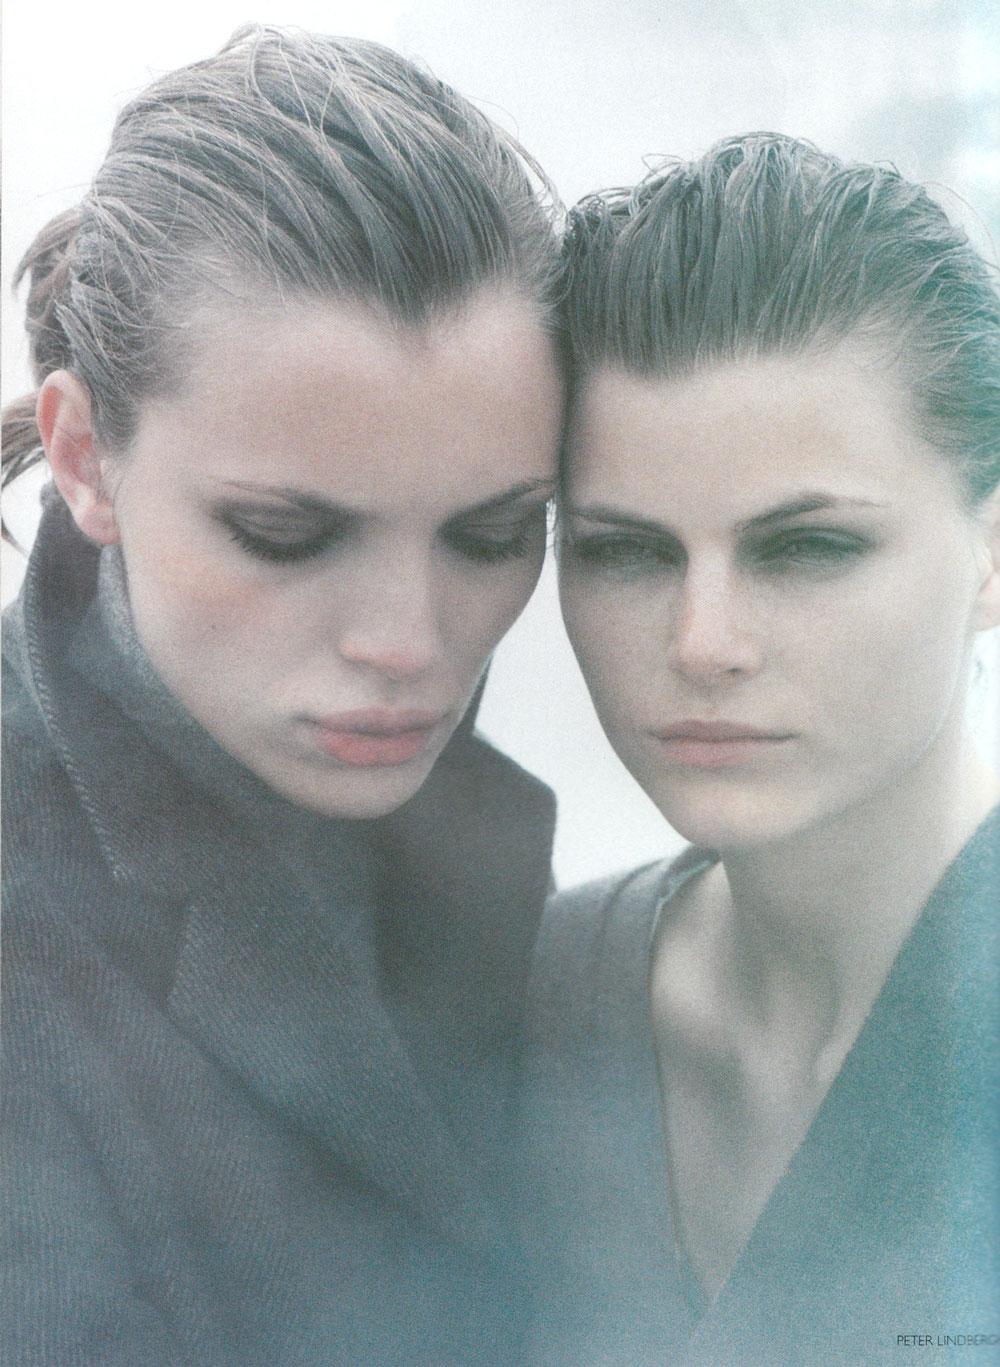 Natalia Semanova, Esther Canadas & Mini Arden in Smoke Screen editorial | Vogue UK September 1997 (photography: Peter Lindbergh, styling: Tiina Laakkonen)